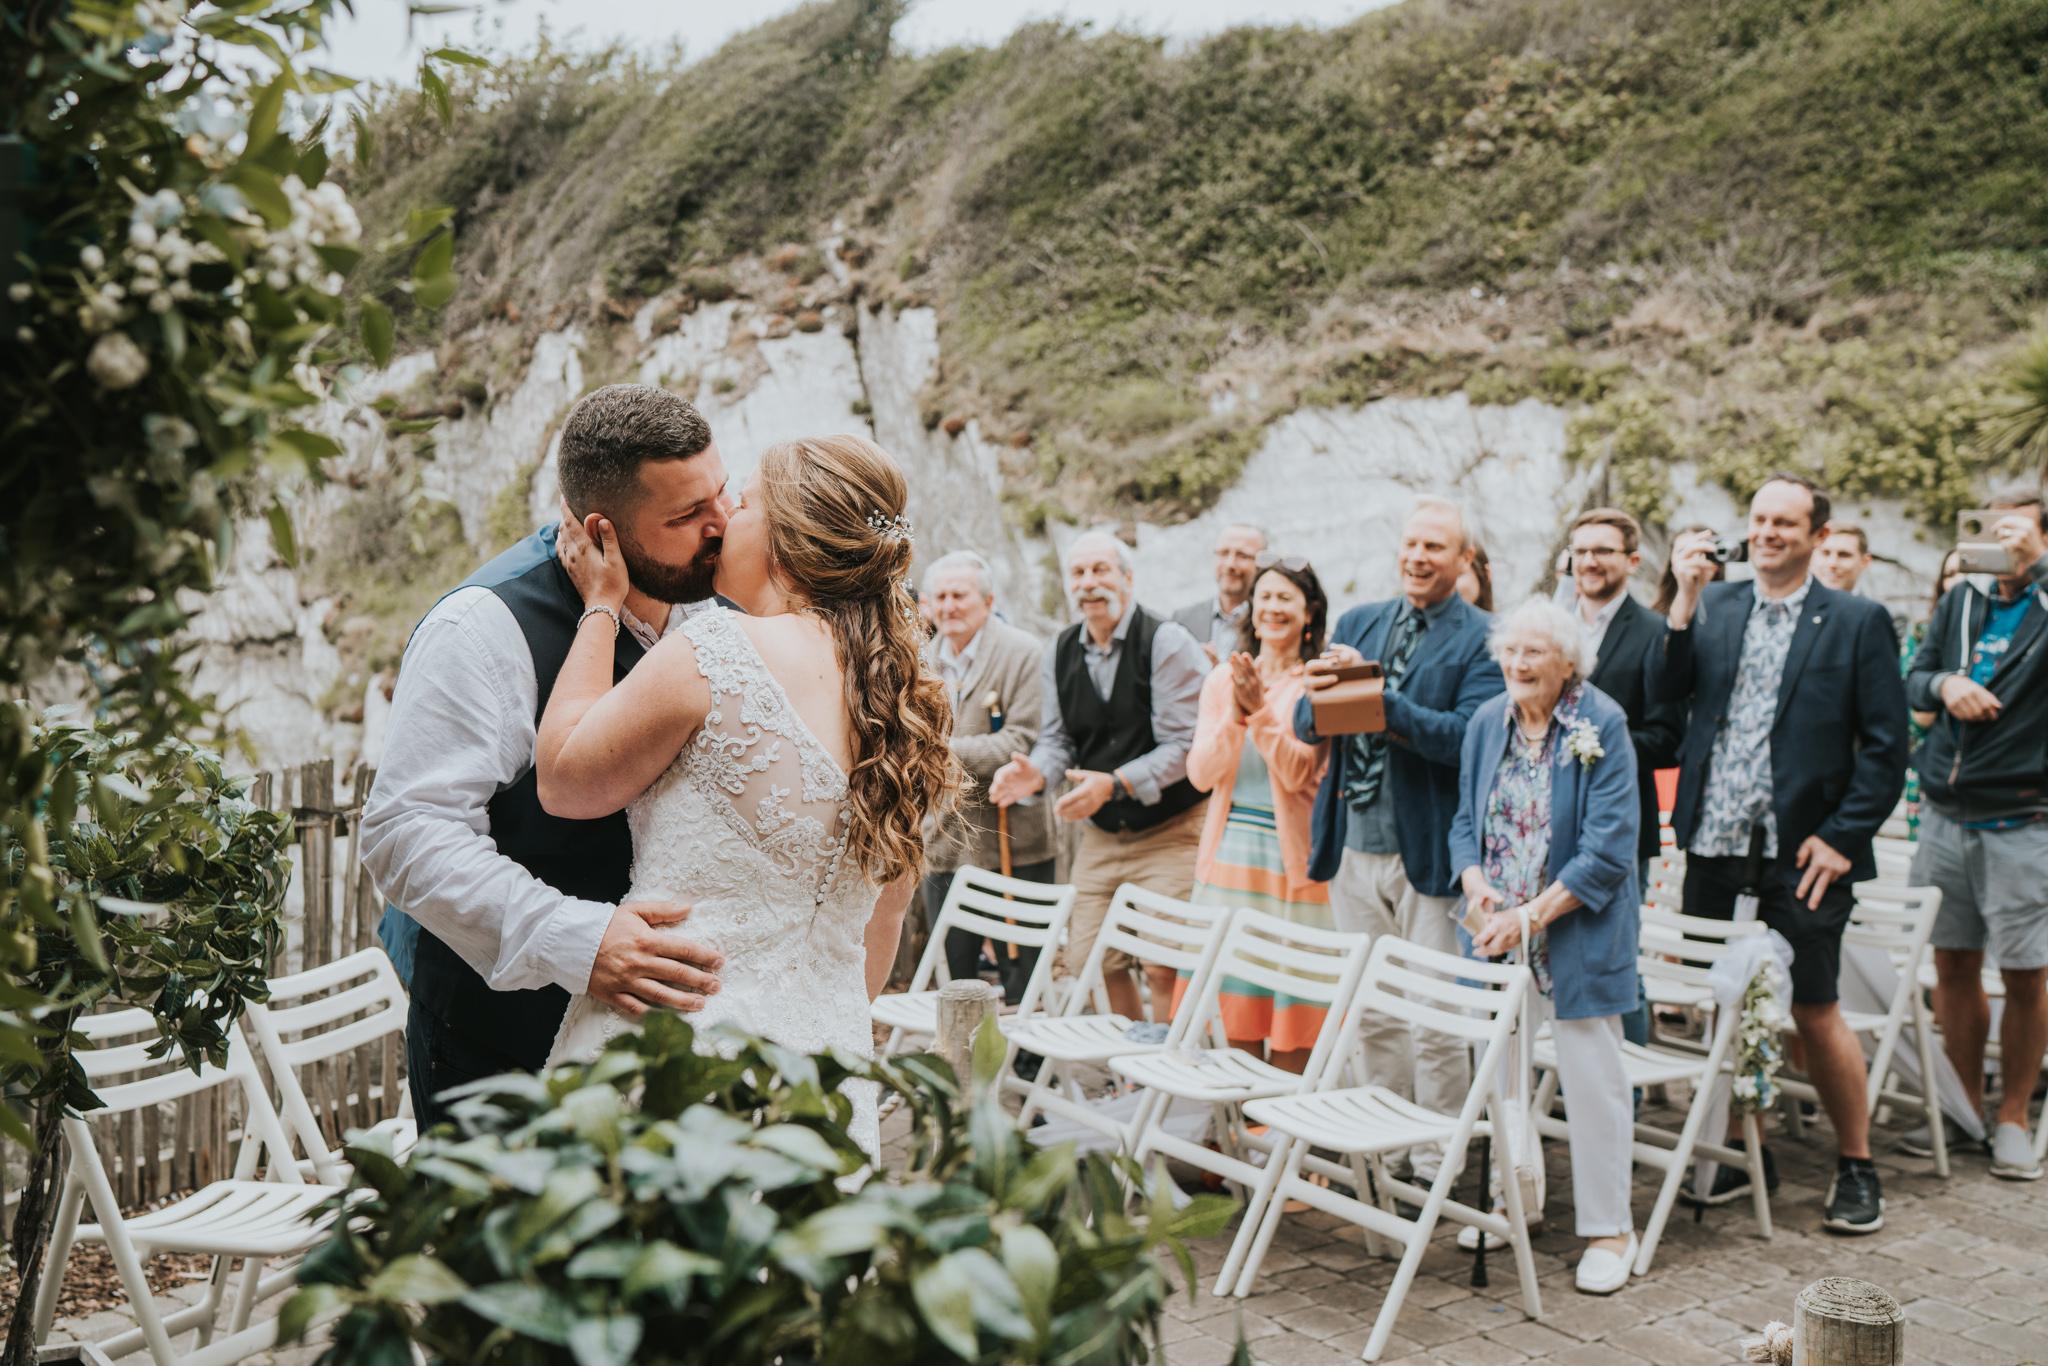 john-amy-relaxed-beach-wedding-tunnels-beaches-ilfracombe-north-devon-grace-elizabeth-colchester-essex-alternative-relaxed-wedding-photography-devon-suffolk-norfolk-essex (64 of 159).jpg